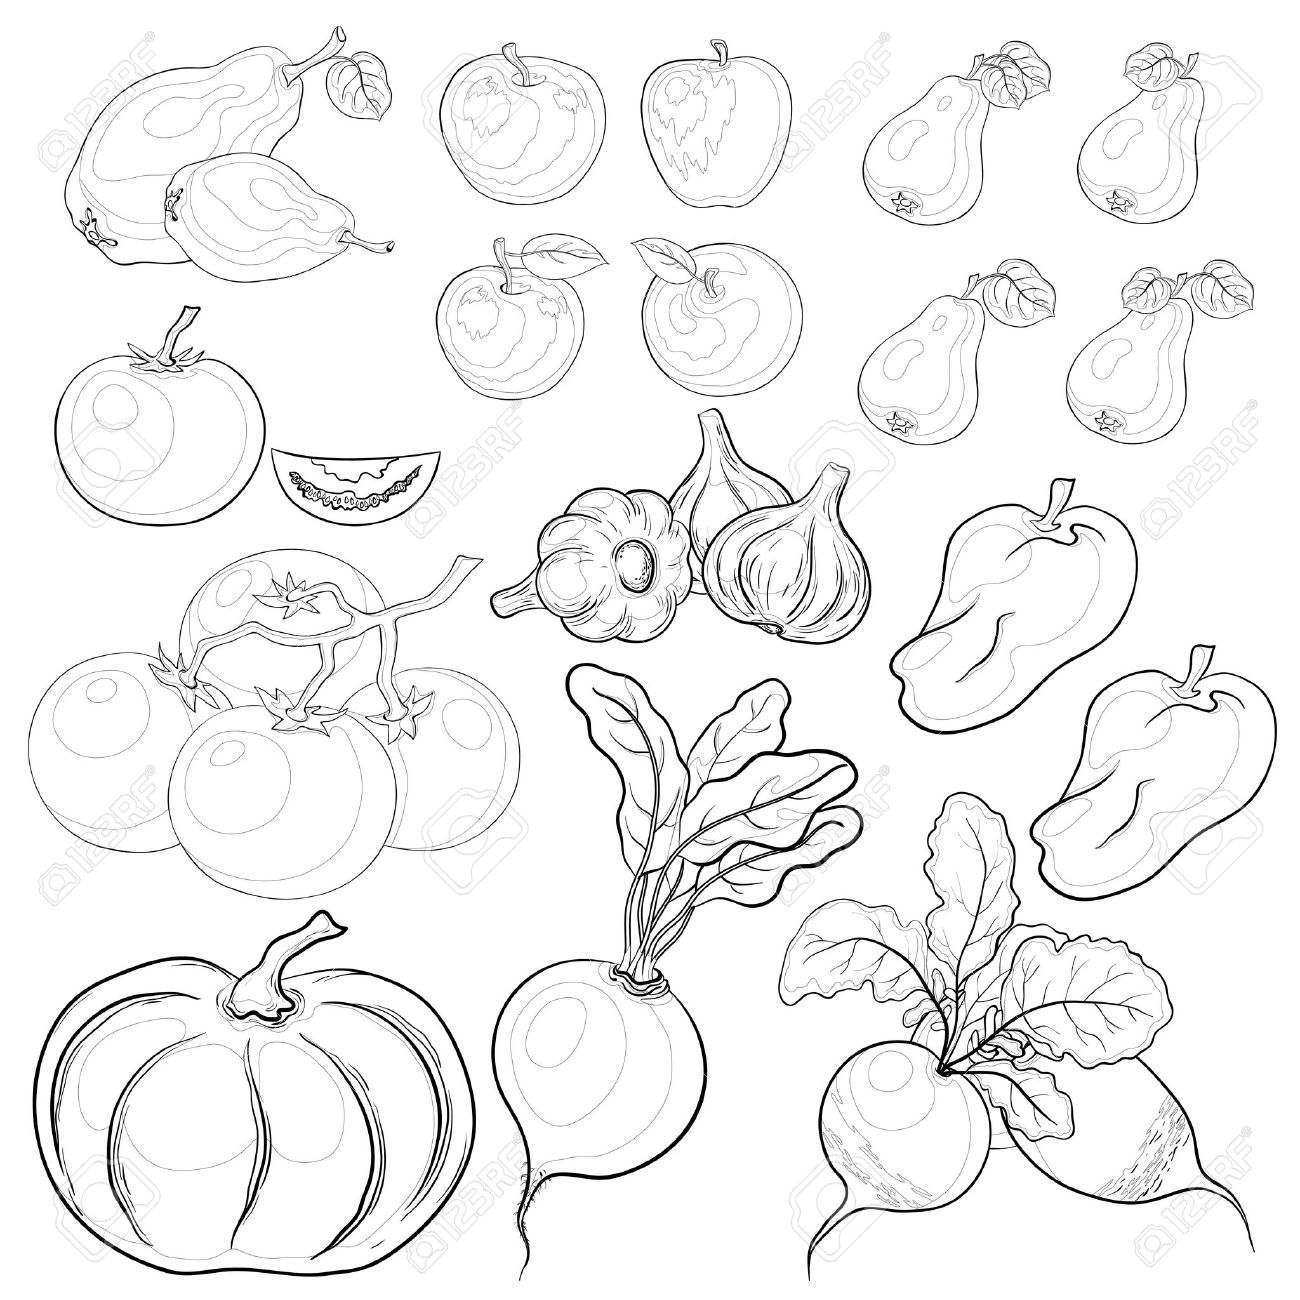 vector set various vegetables and fruits monochrome contours